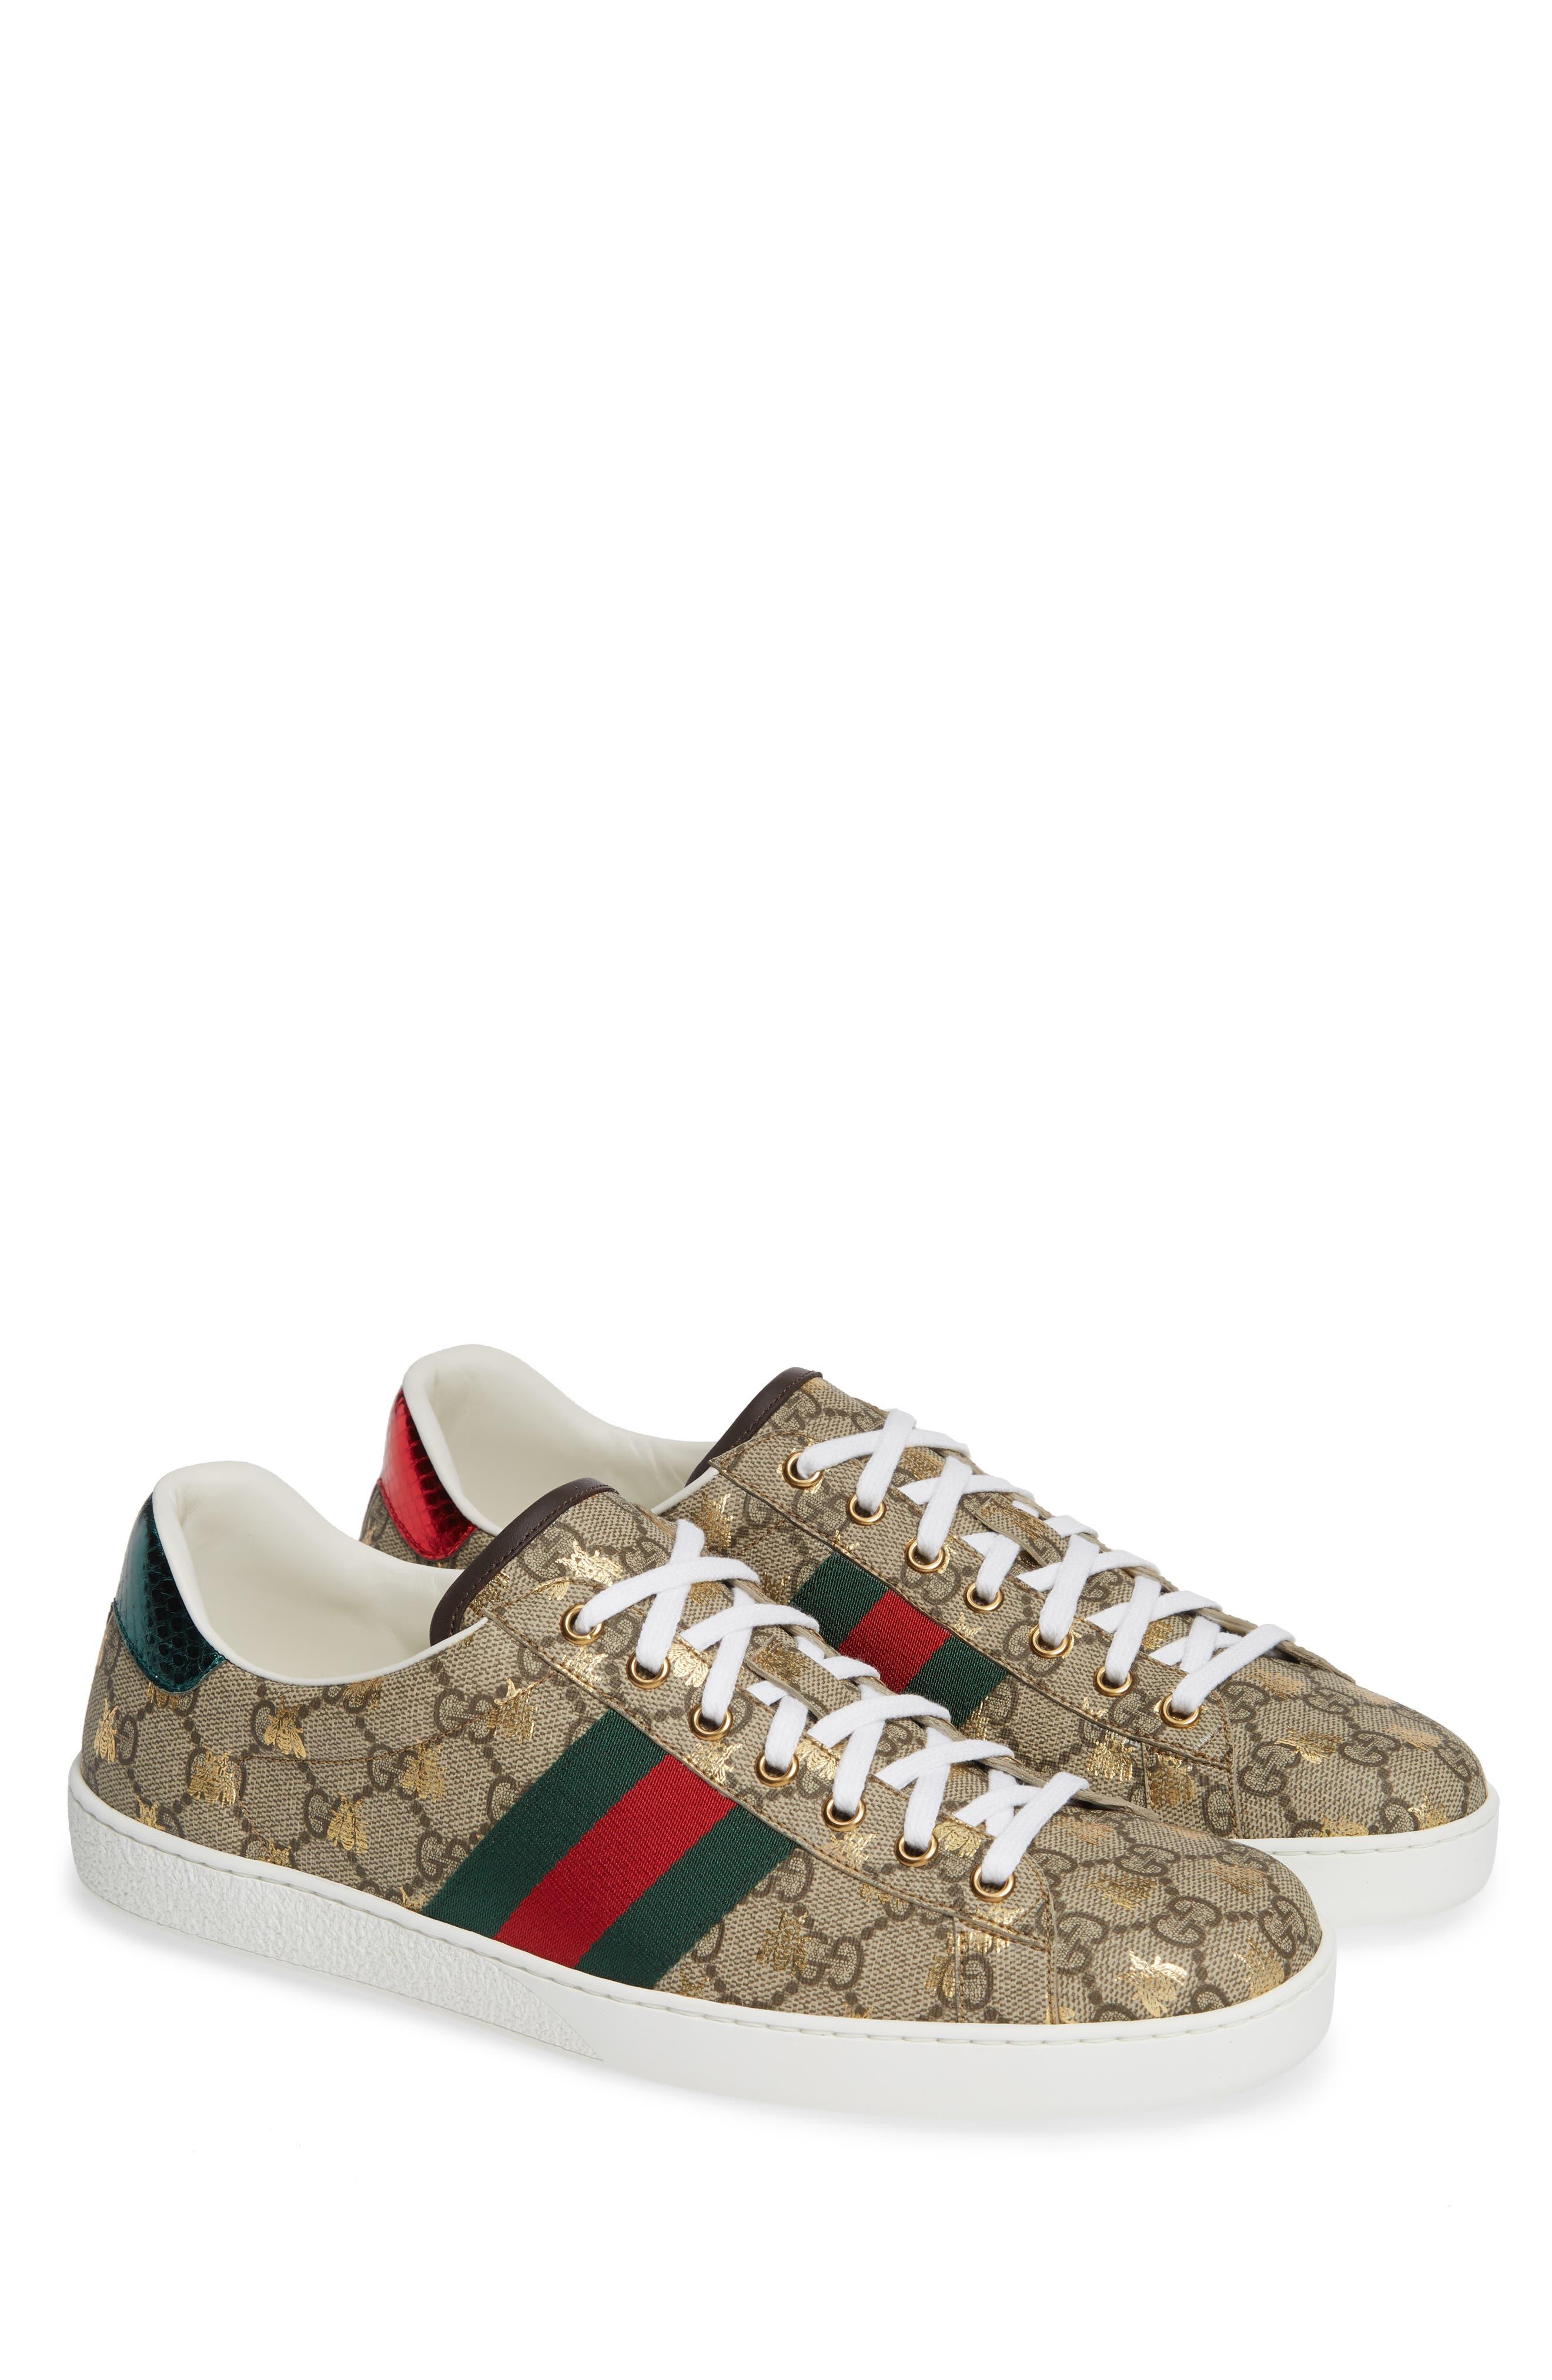 GUCCI New Ace GG Supreme Sneaker, Main, color, BEIGE/ GOLD